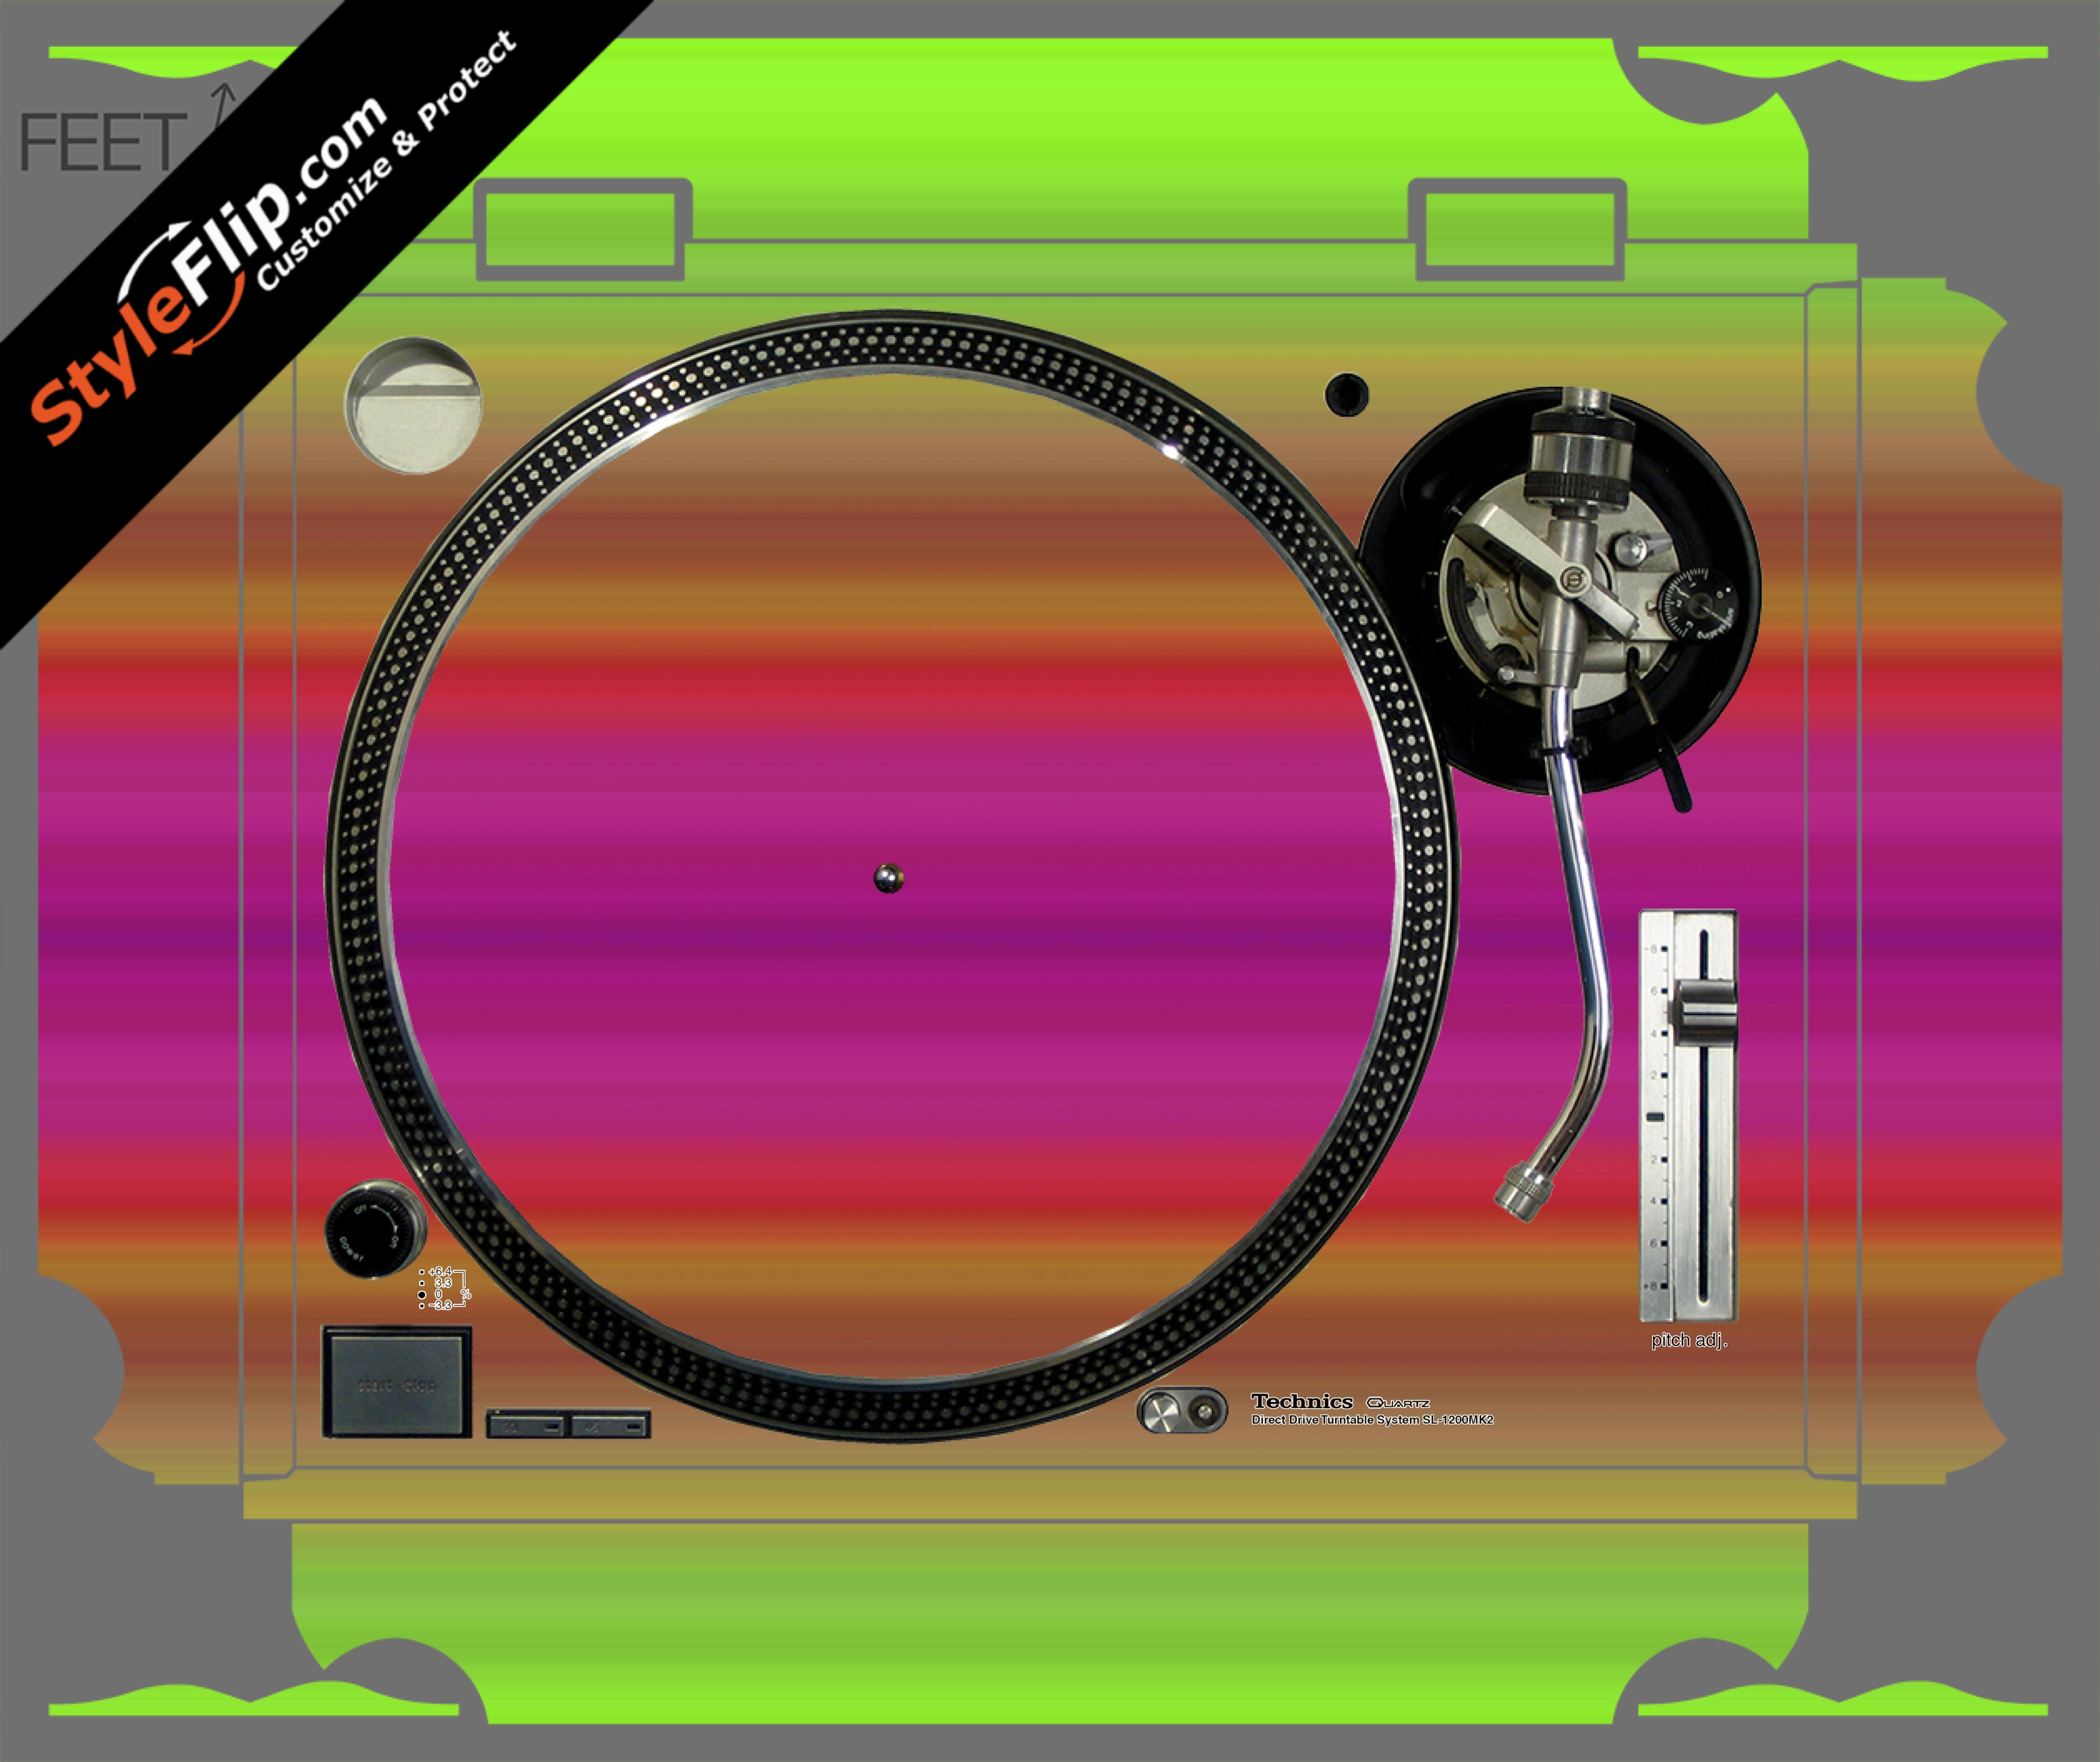 Rainbow Technics SL-1200 MK2